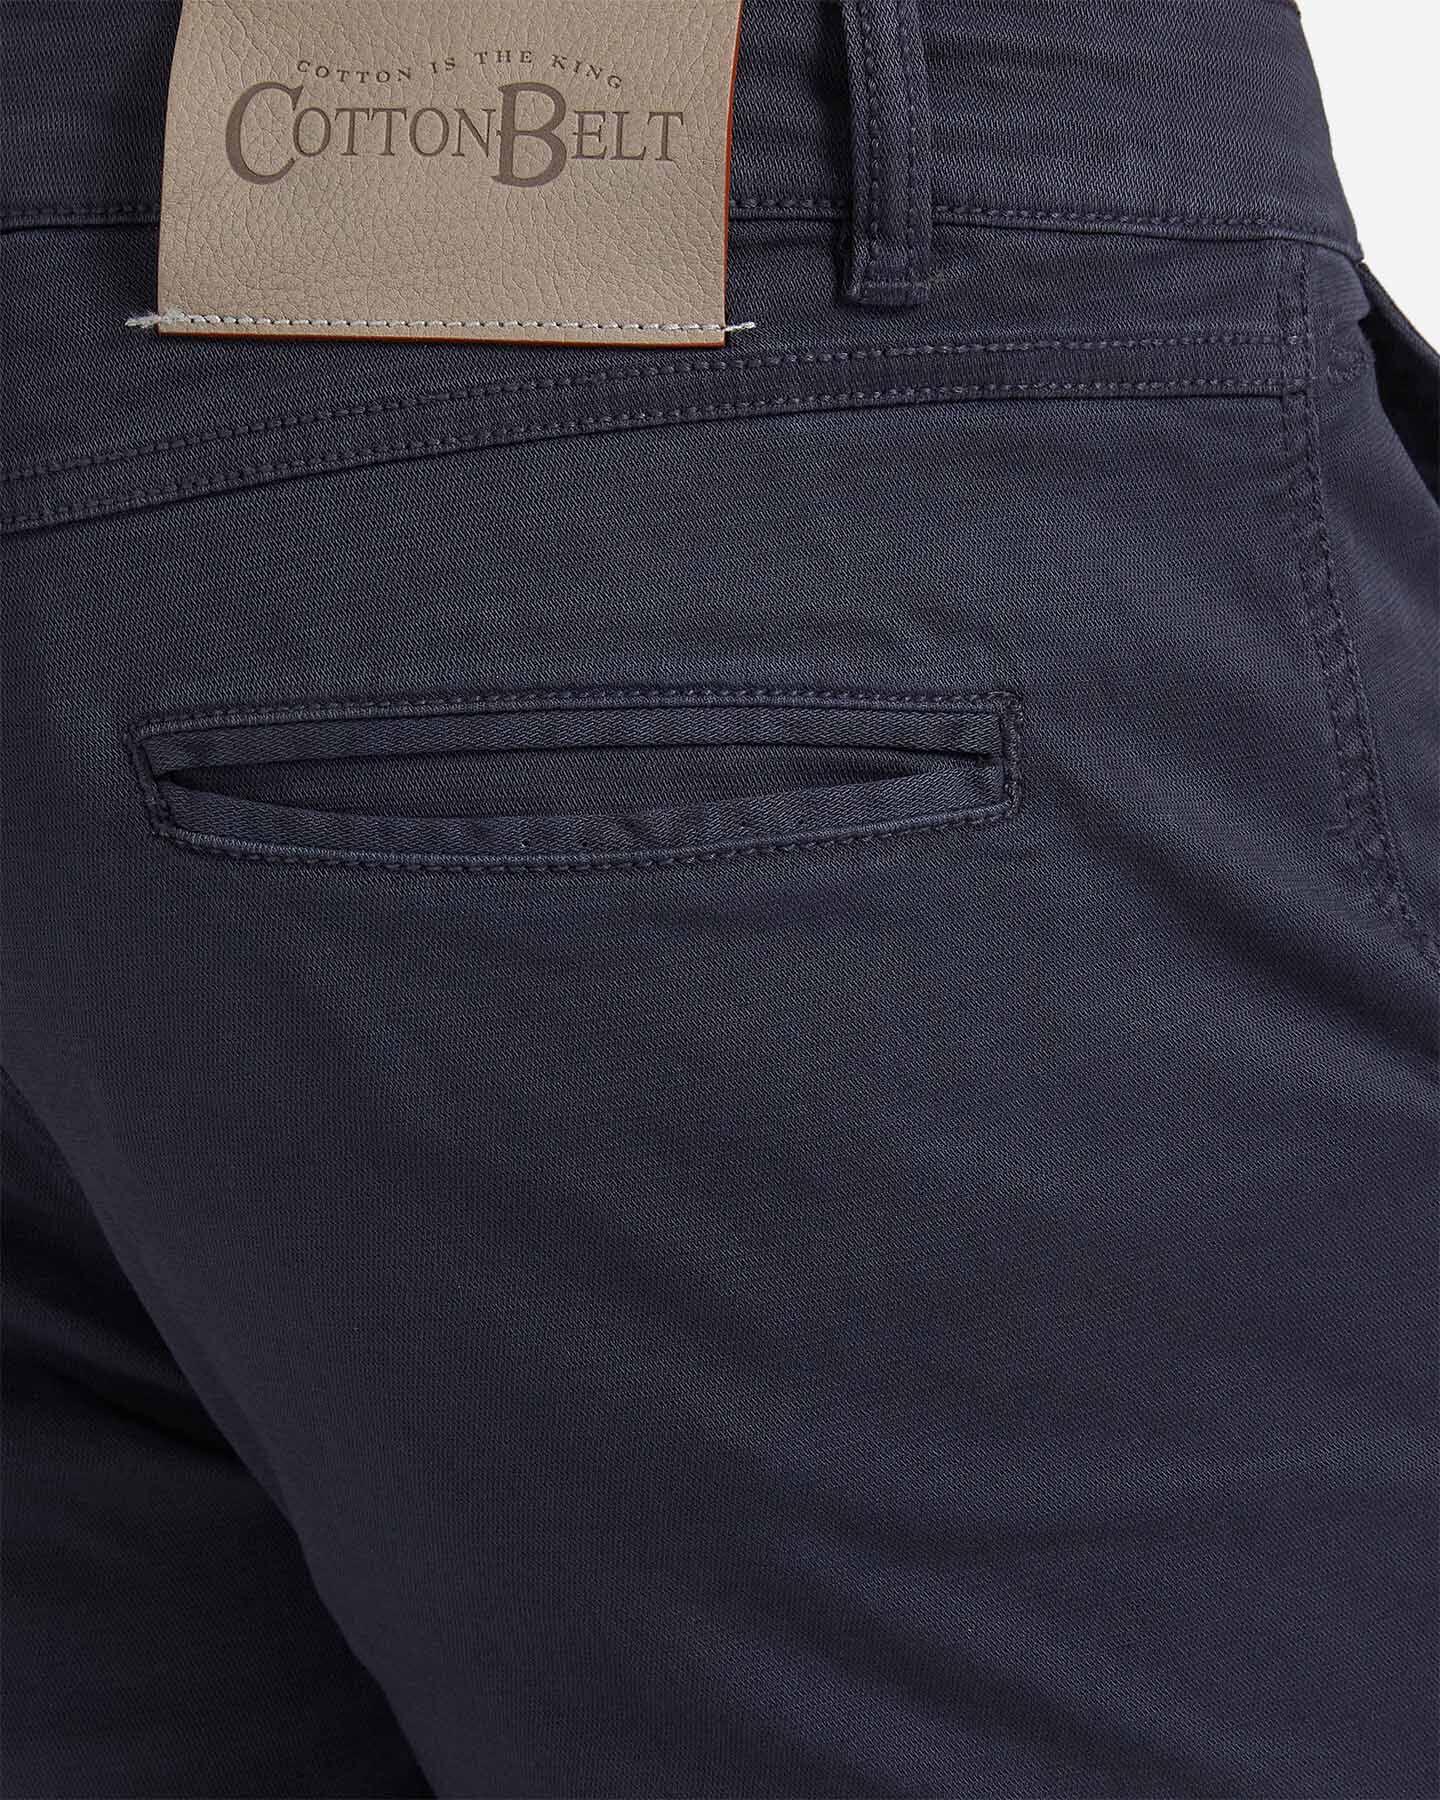 Pantalone COTTON BELT CHINO SLIM M S4076641 scatto 3